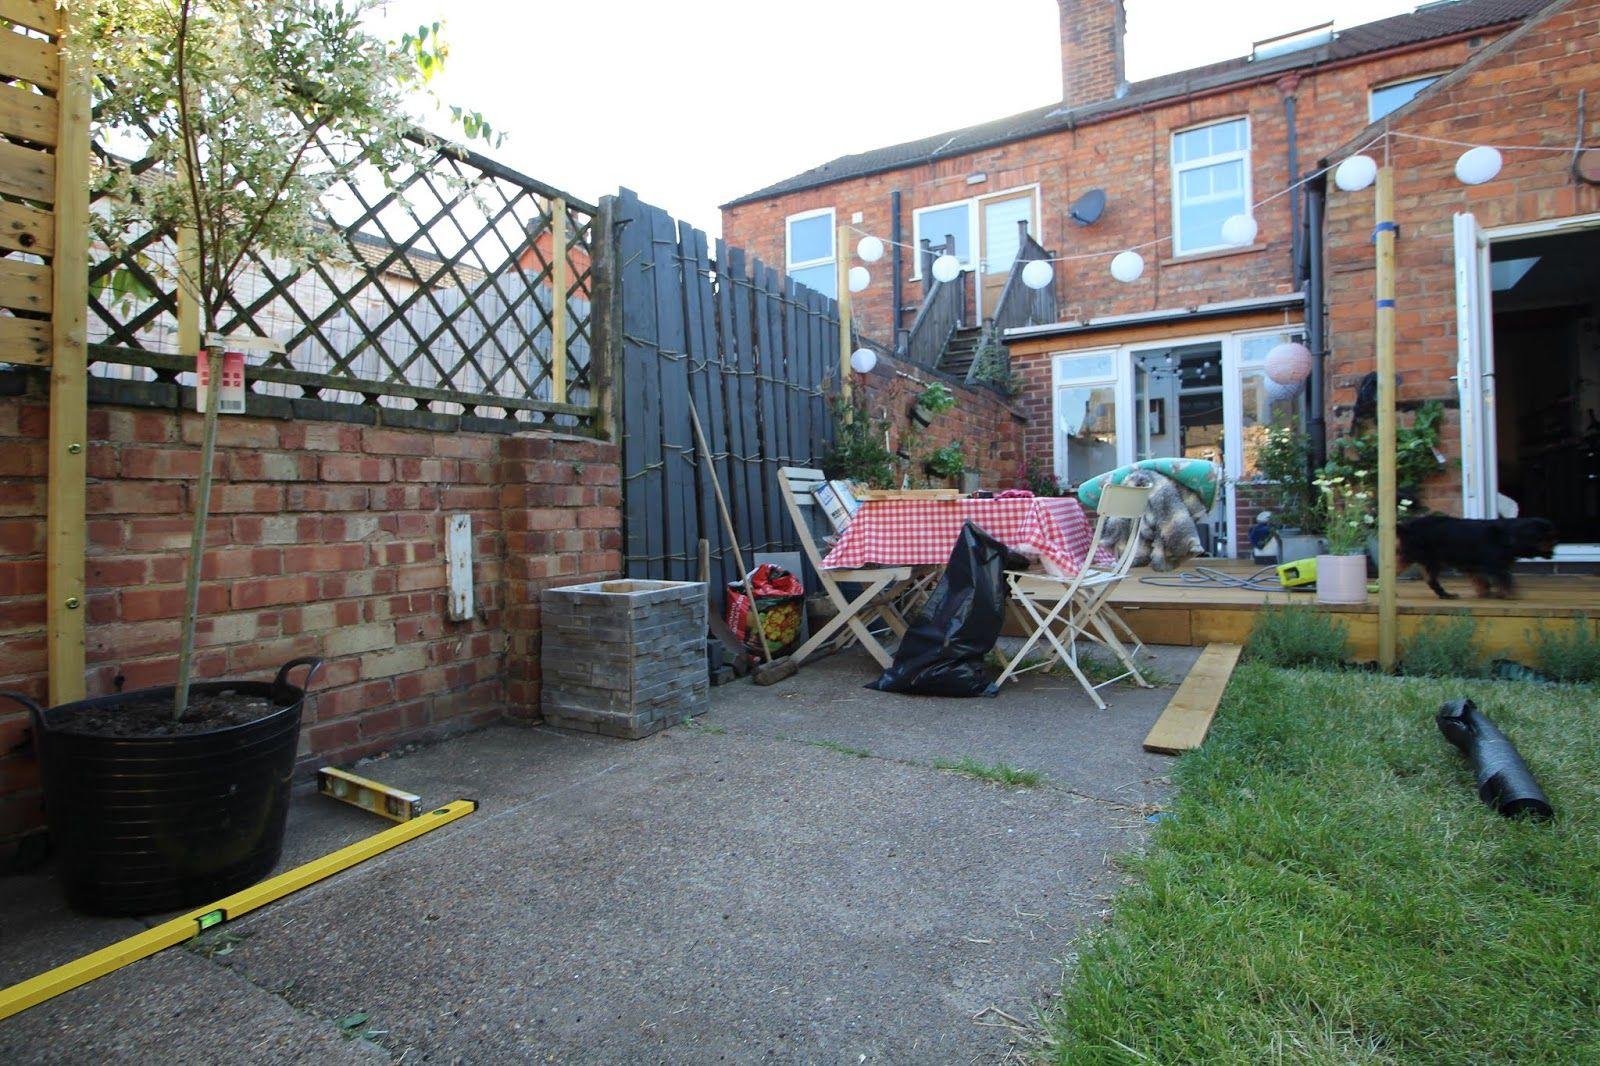 Laying Gravel In the Garden | Patio, Diy patio, Renovation